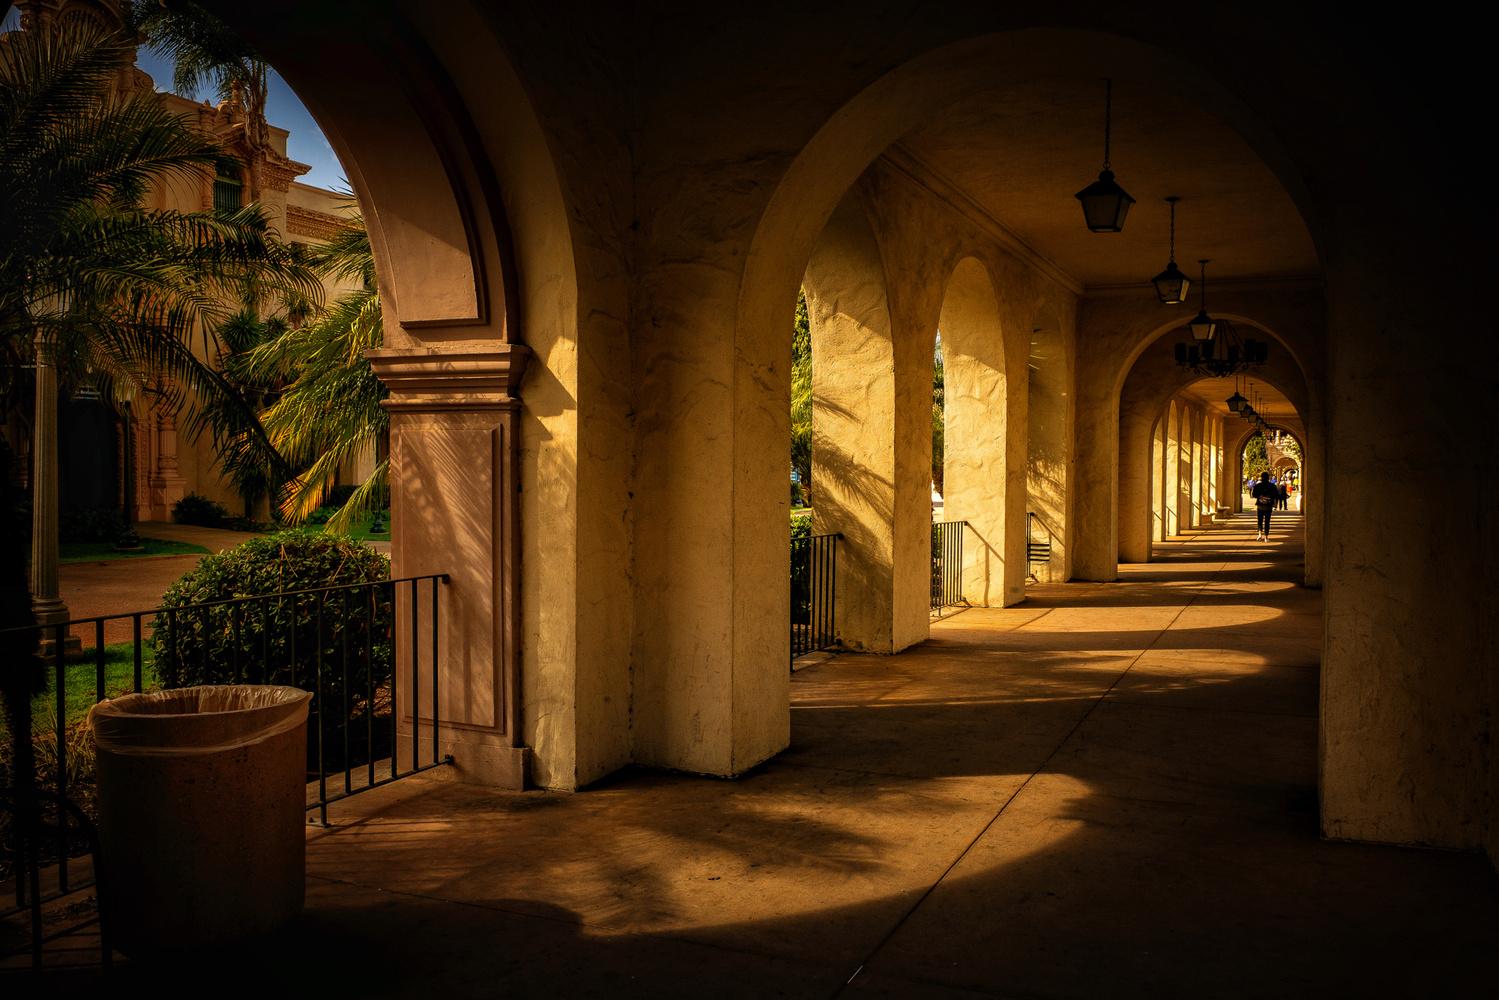 Balboa Park by Jonathan Hobbs